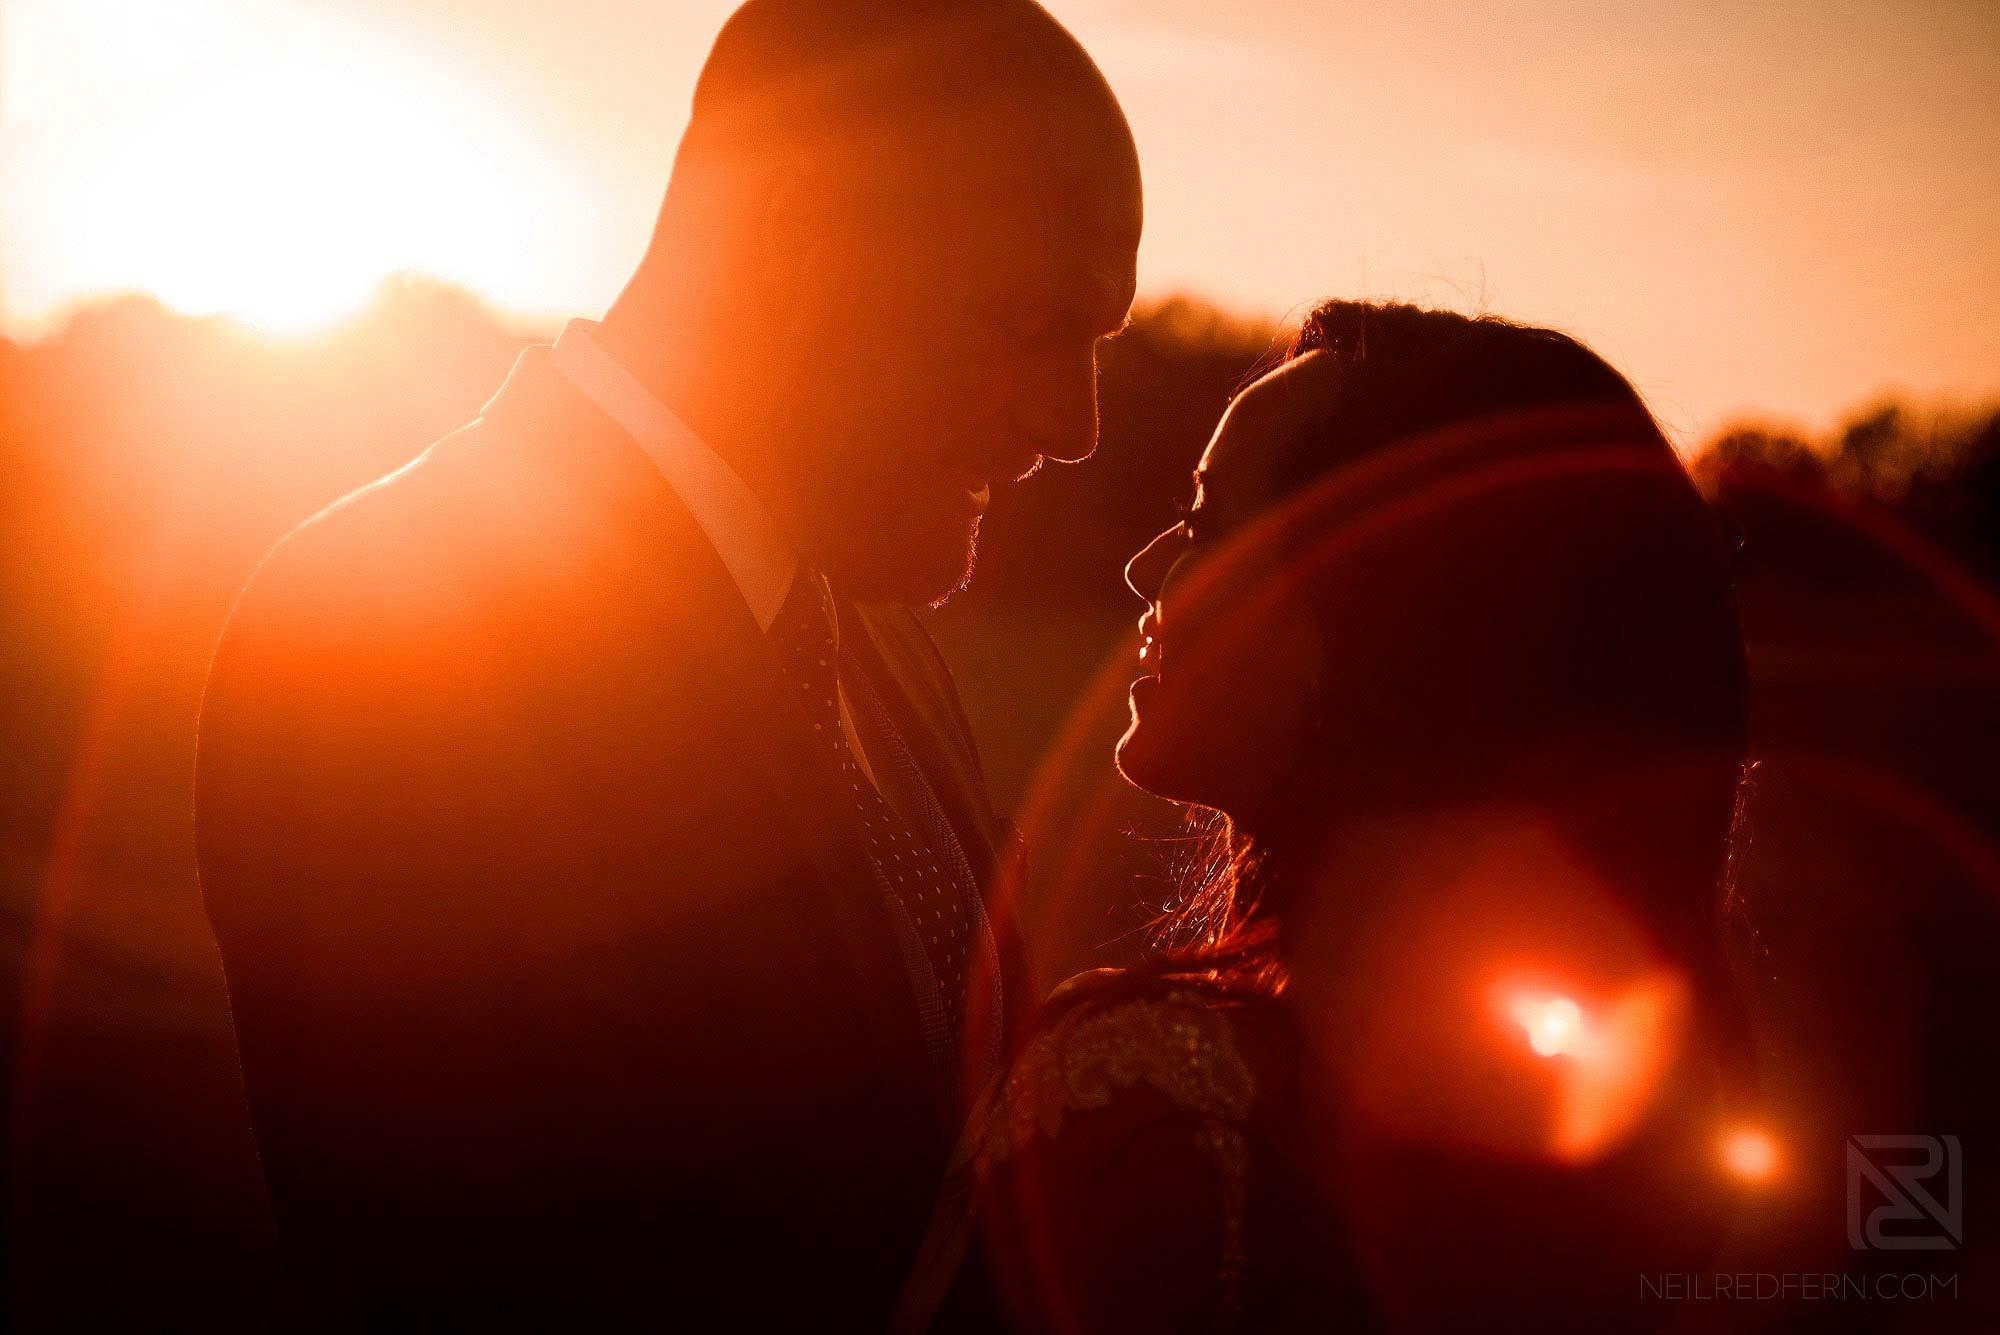 sunset portrait of newlyweds at sunset